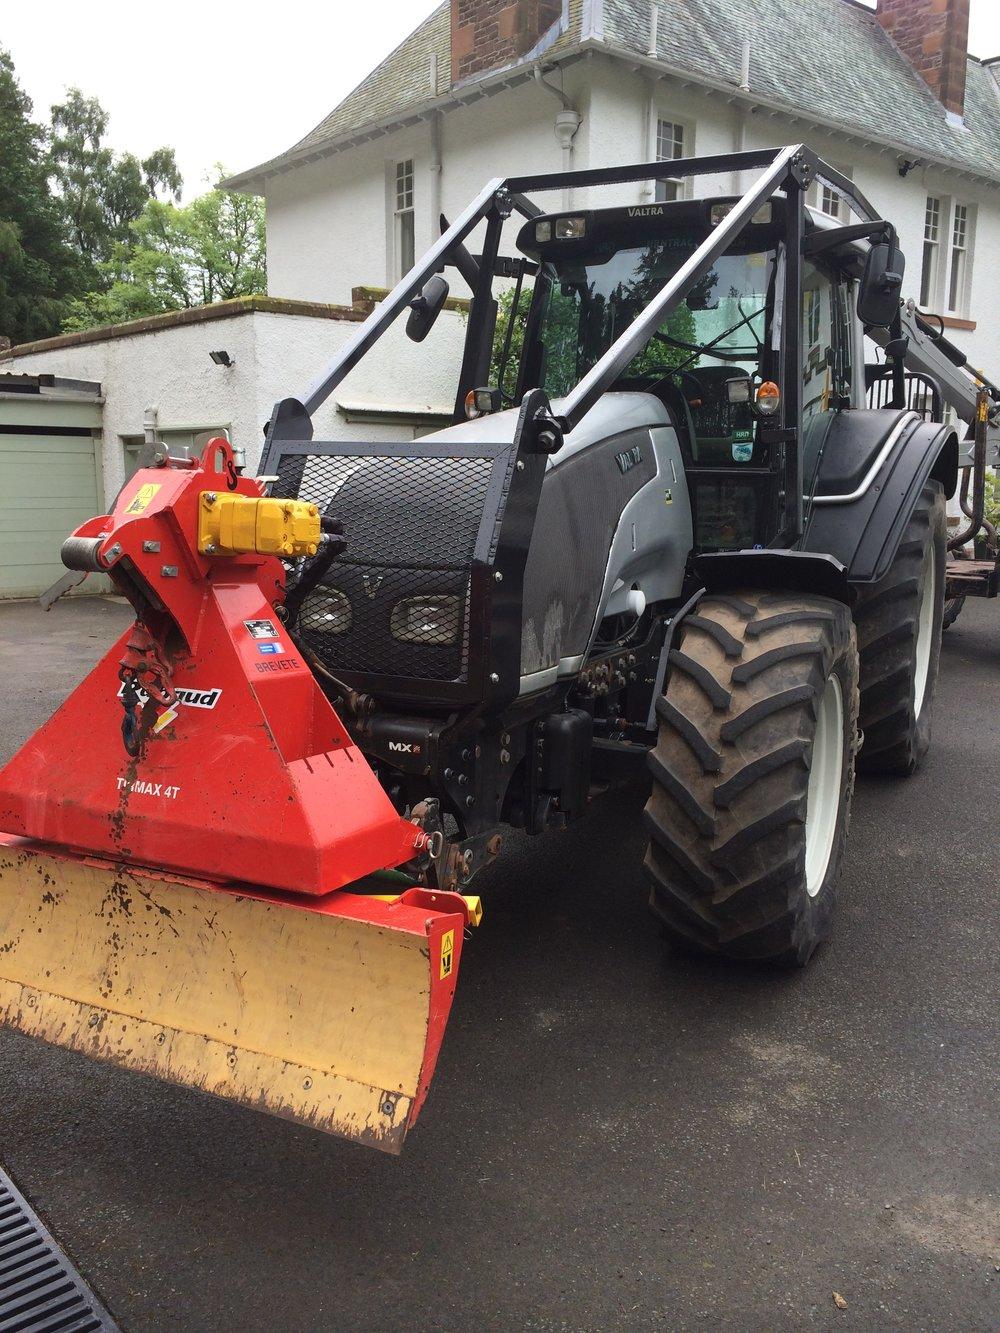 Tractor & Winch 1.JPG